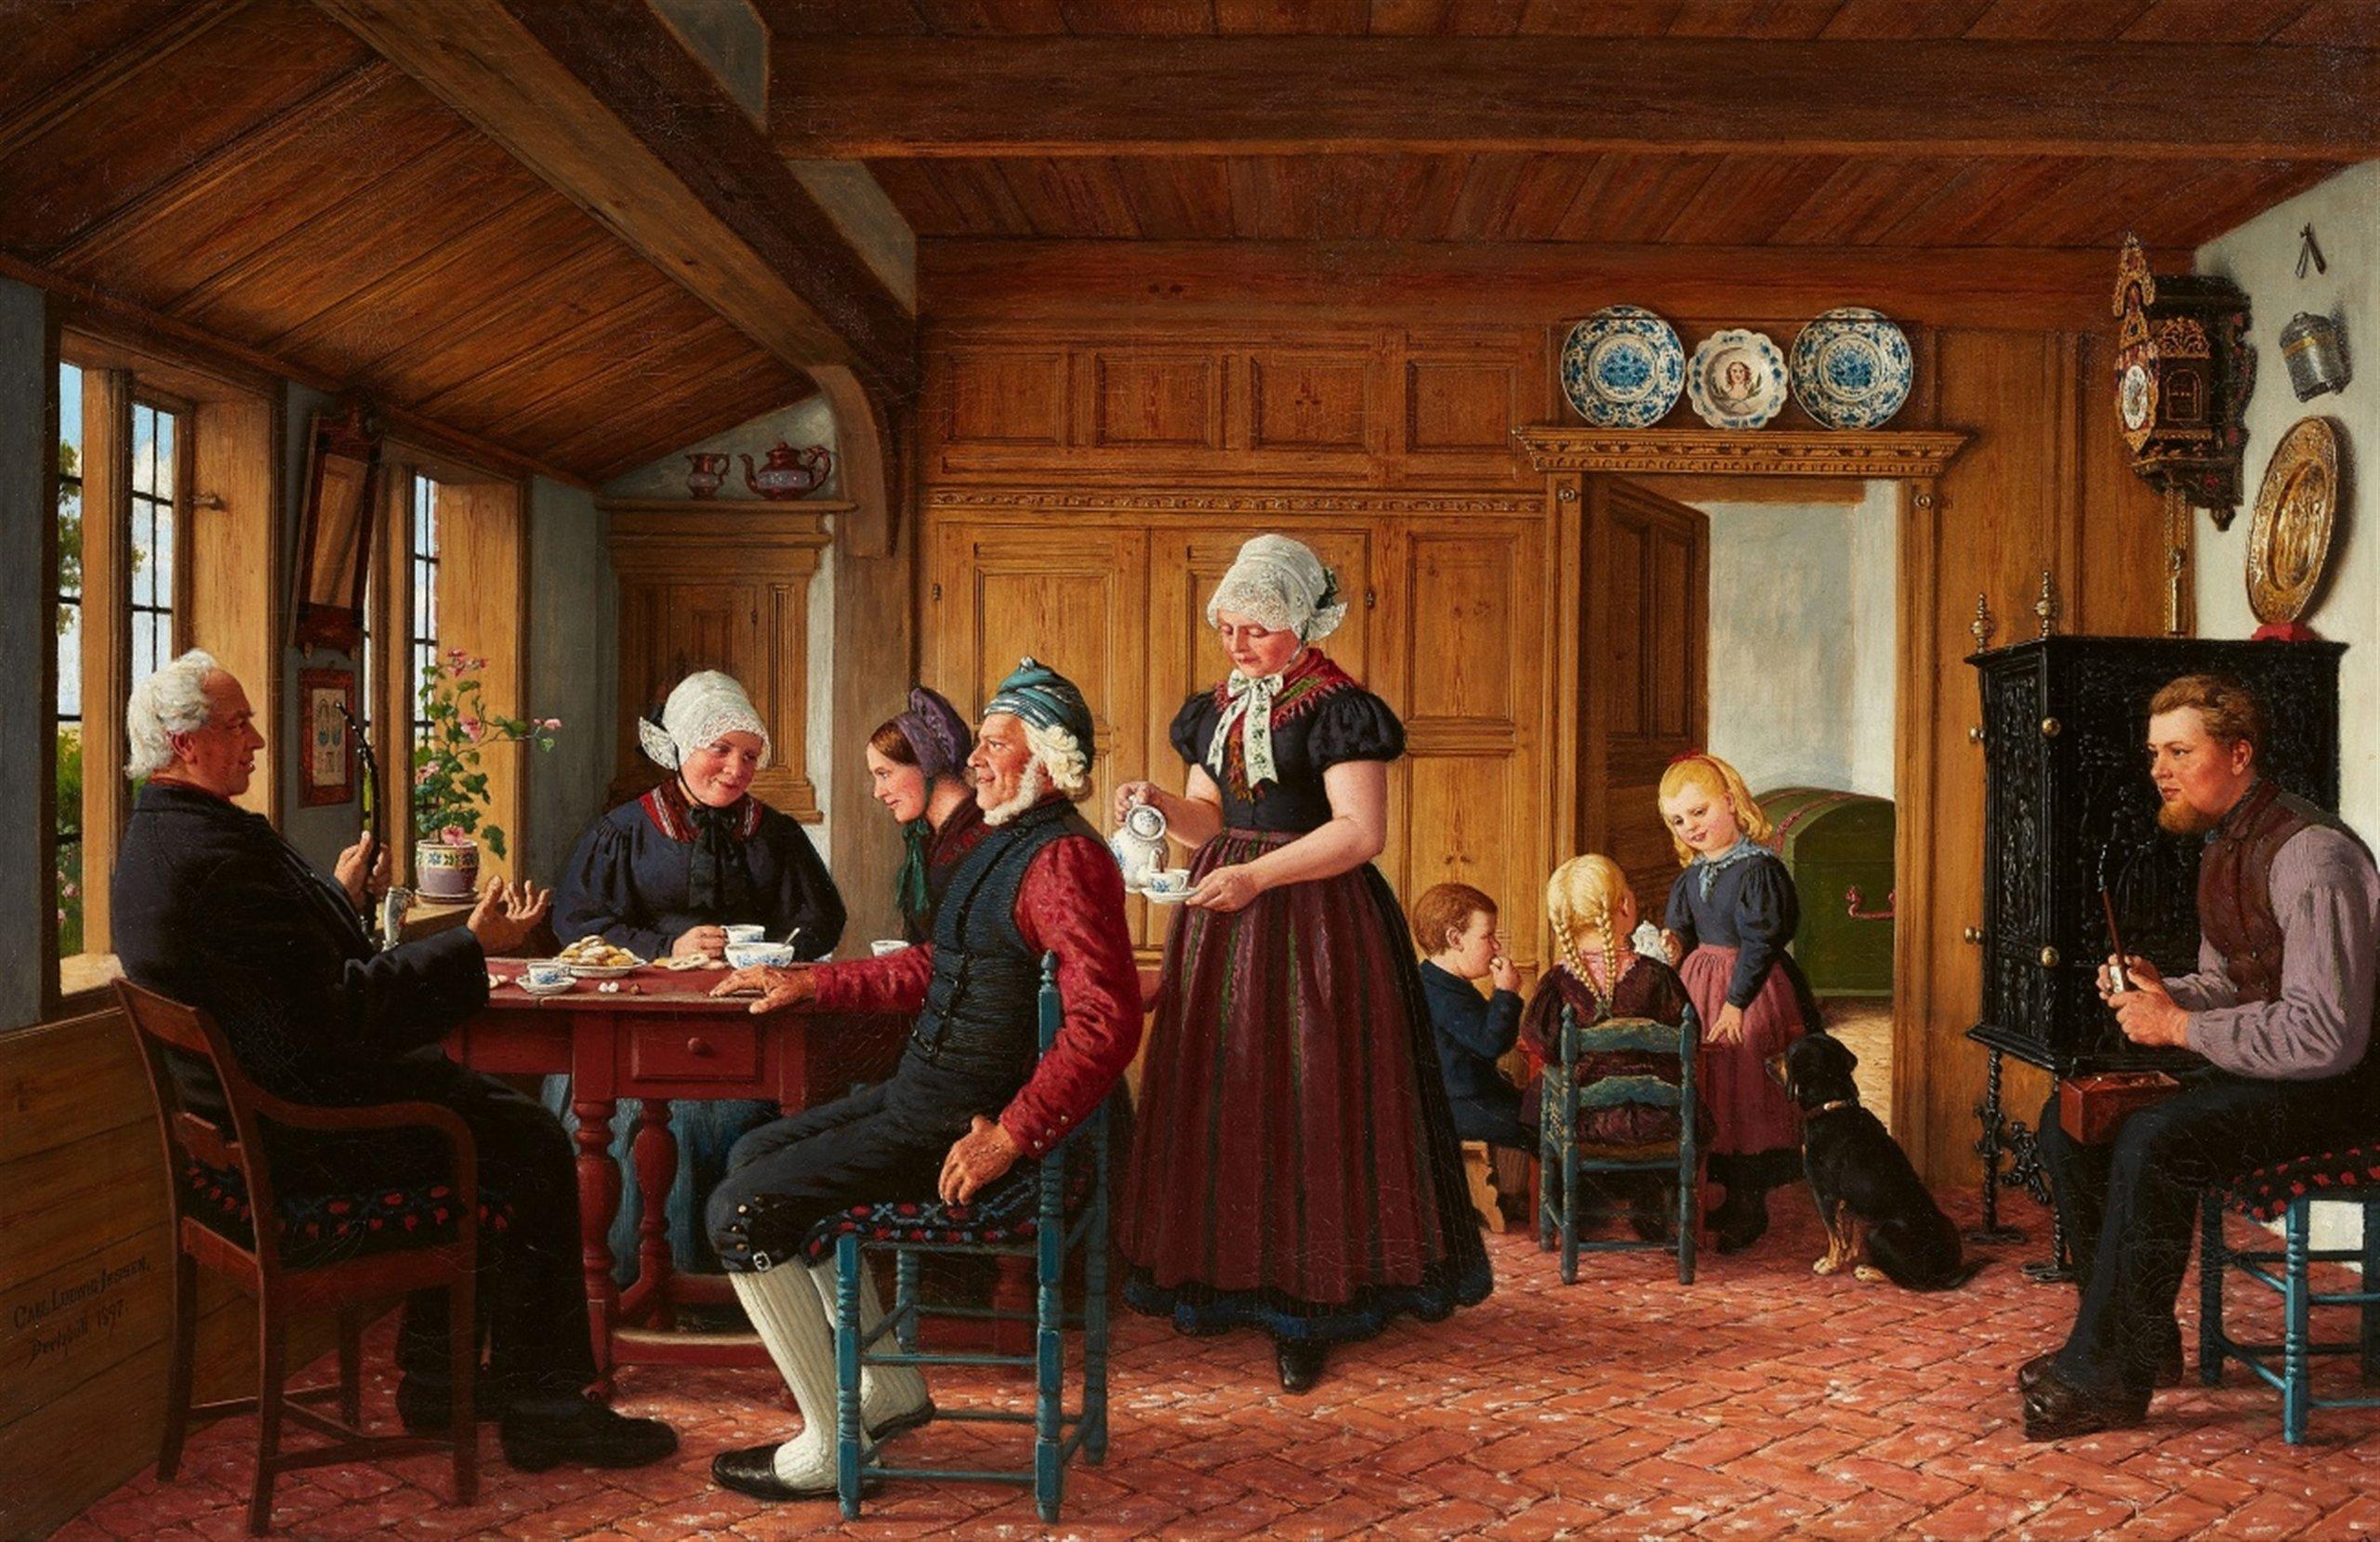 csm_Lempertz-1102-93-The-Klaus-J-Jacobs-Collection-Karl-Ludwig-Jessen-A-Frisian-Family-Drinking_680bedbf58